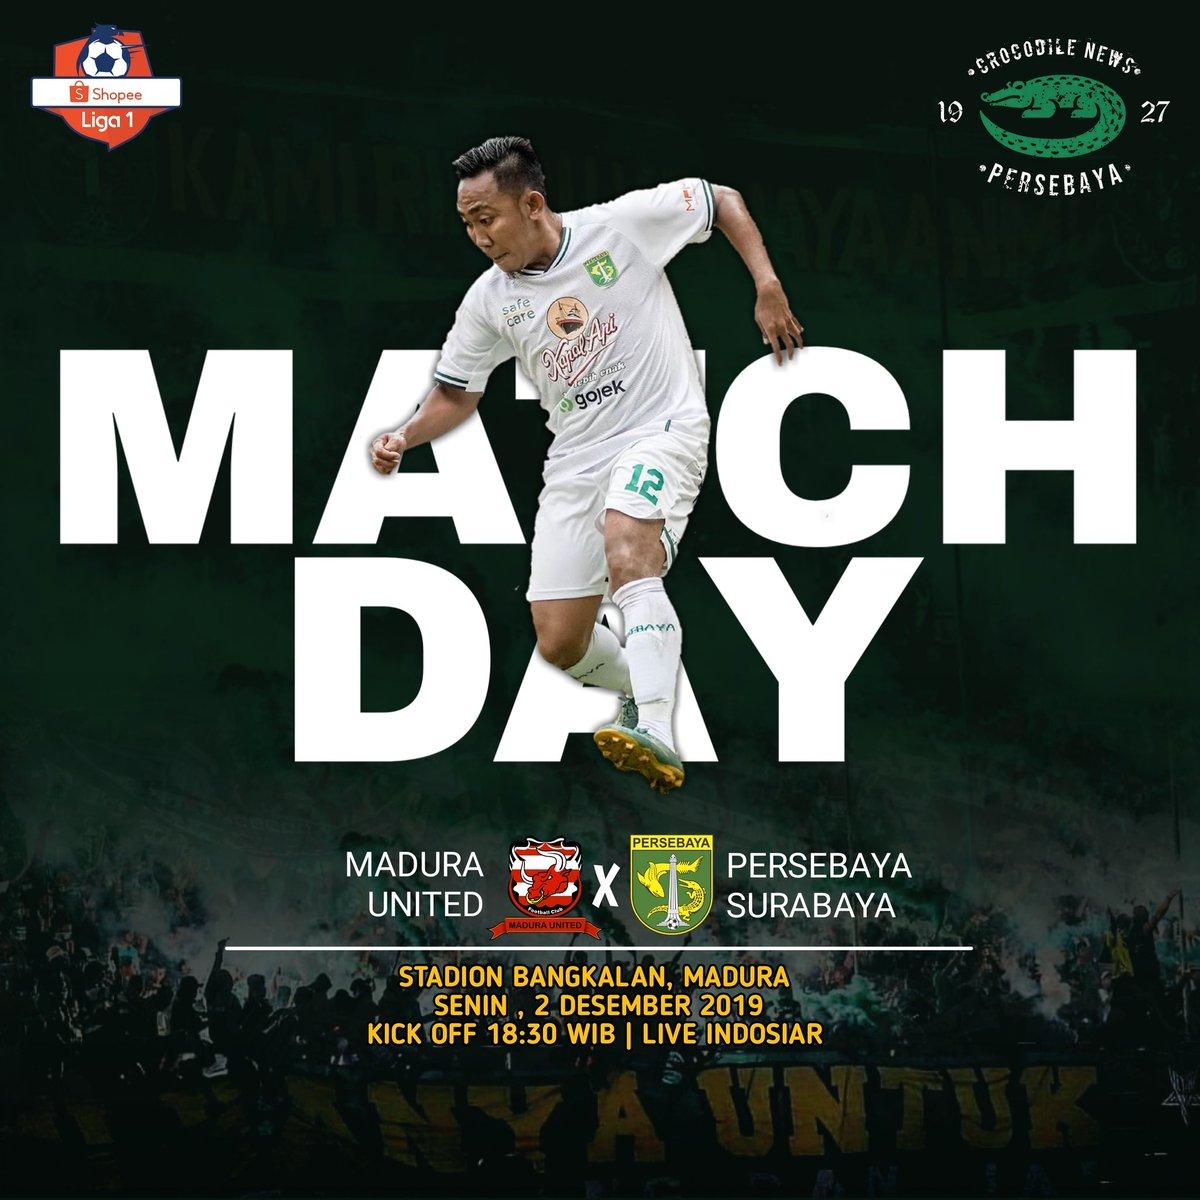 MATCH DAY! PEKAN 30!💚🐊 _ 🏆 Shopee Liga 1! 🆚 Madura United Fc Vs Persebaya Surabaya 📆 Senin, 2 Desember 2019 ⏰ Kick Off 18.30 WIB 🏟 Stadion Gelora Bangkalan, Madura 📺 Live Indosiar  Ayo Jol curi poin di Madura! 🔥 #Persebaya #bajolijo #greenforce #CrocodileNews #bonek